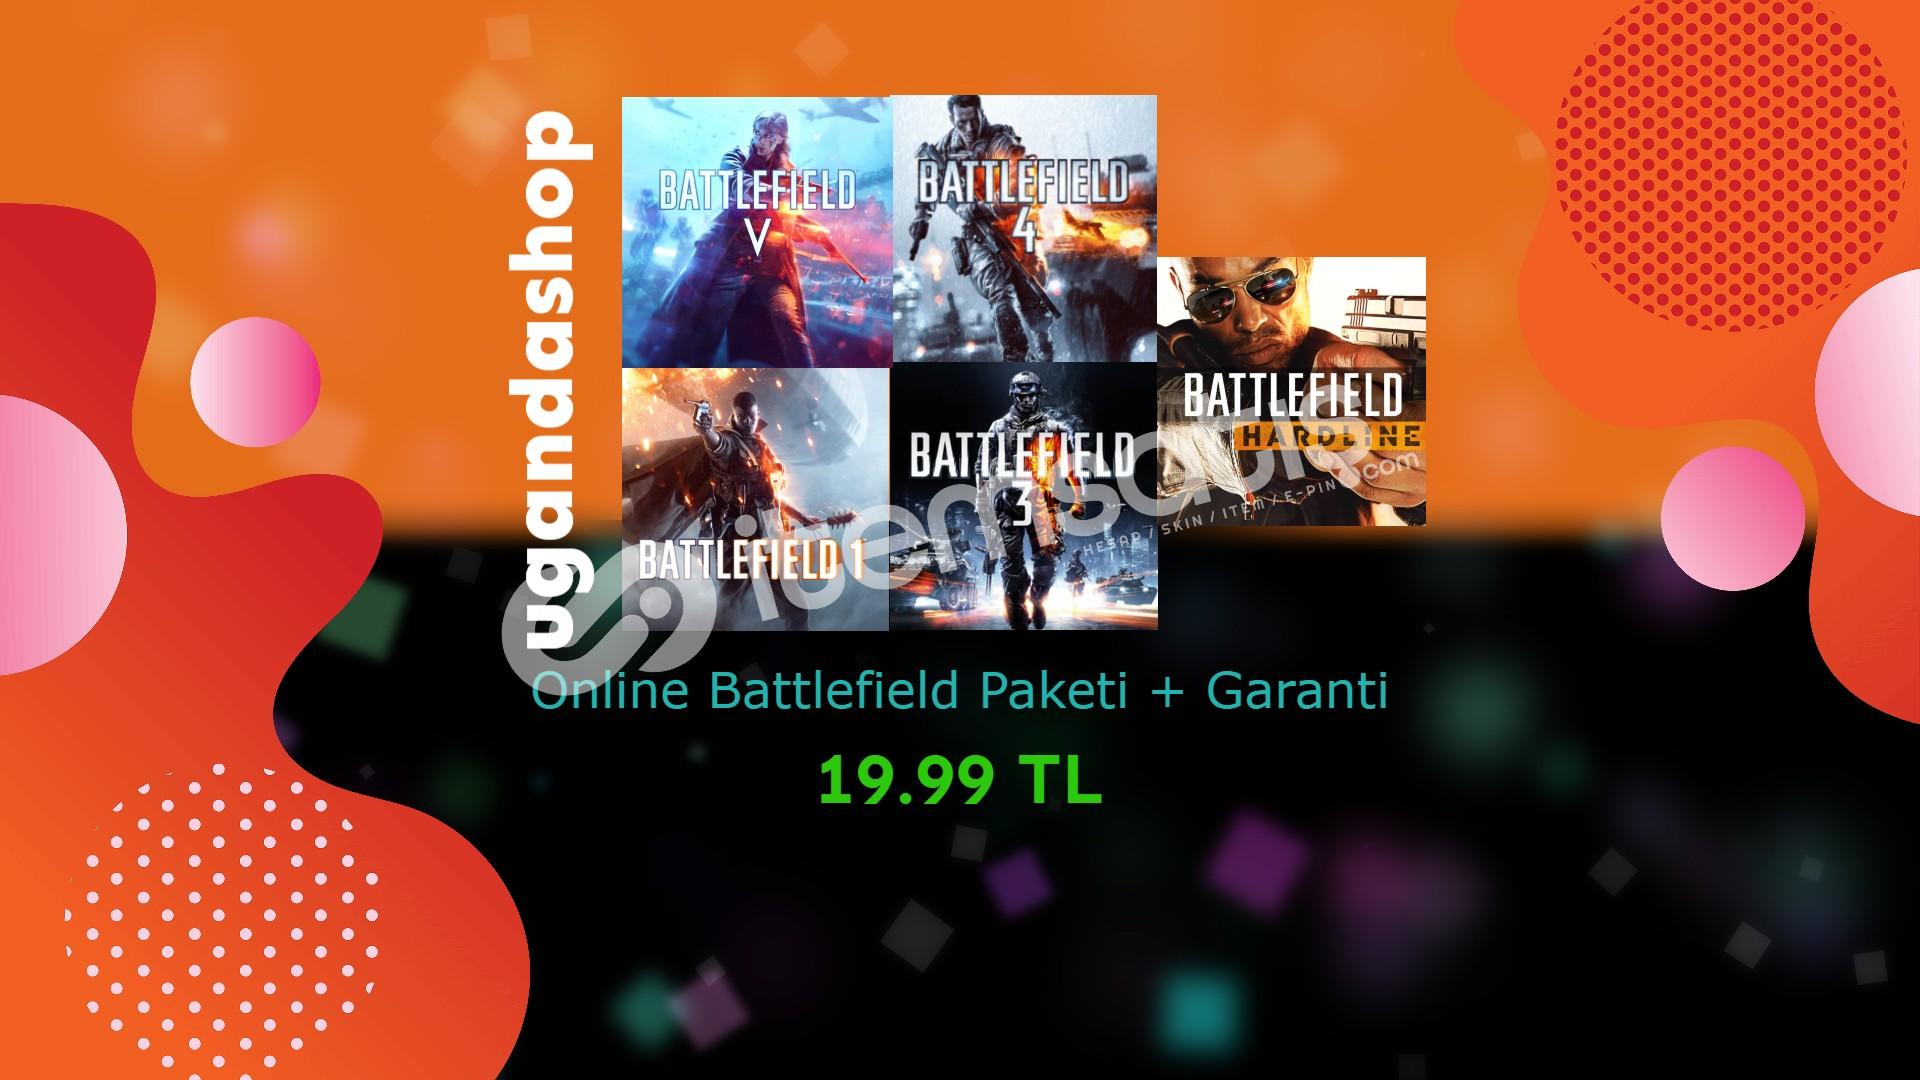 Battlefield Paketi 5-4-3-1-Hardline Online Origin + Garanti